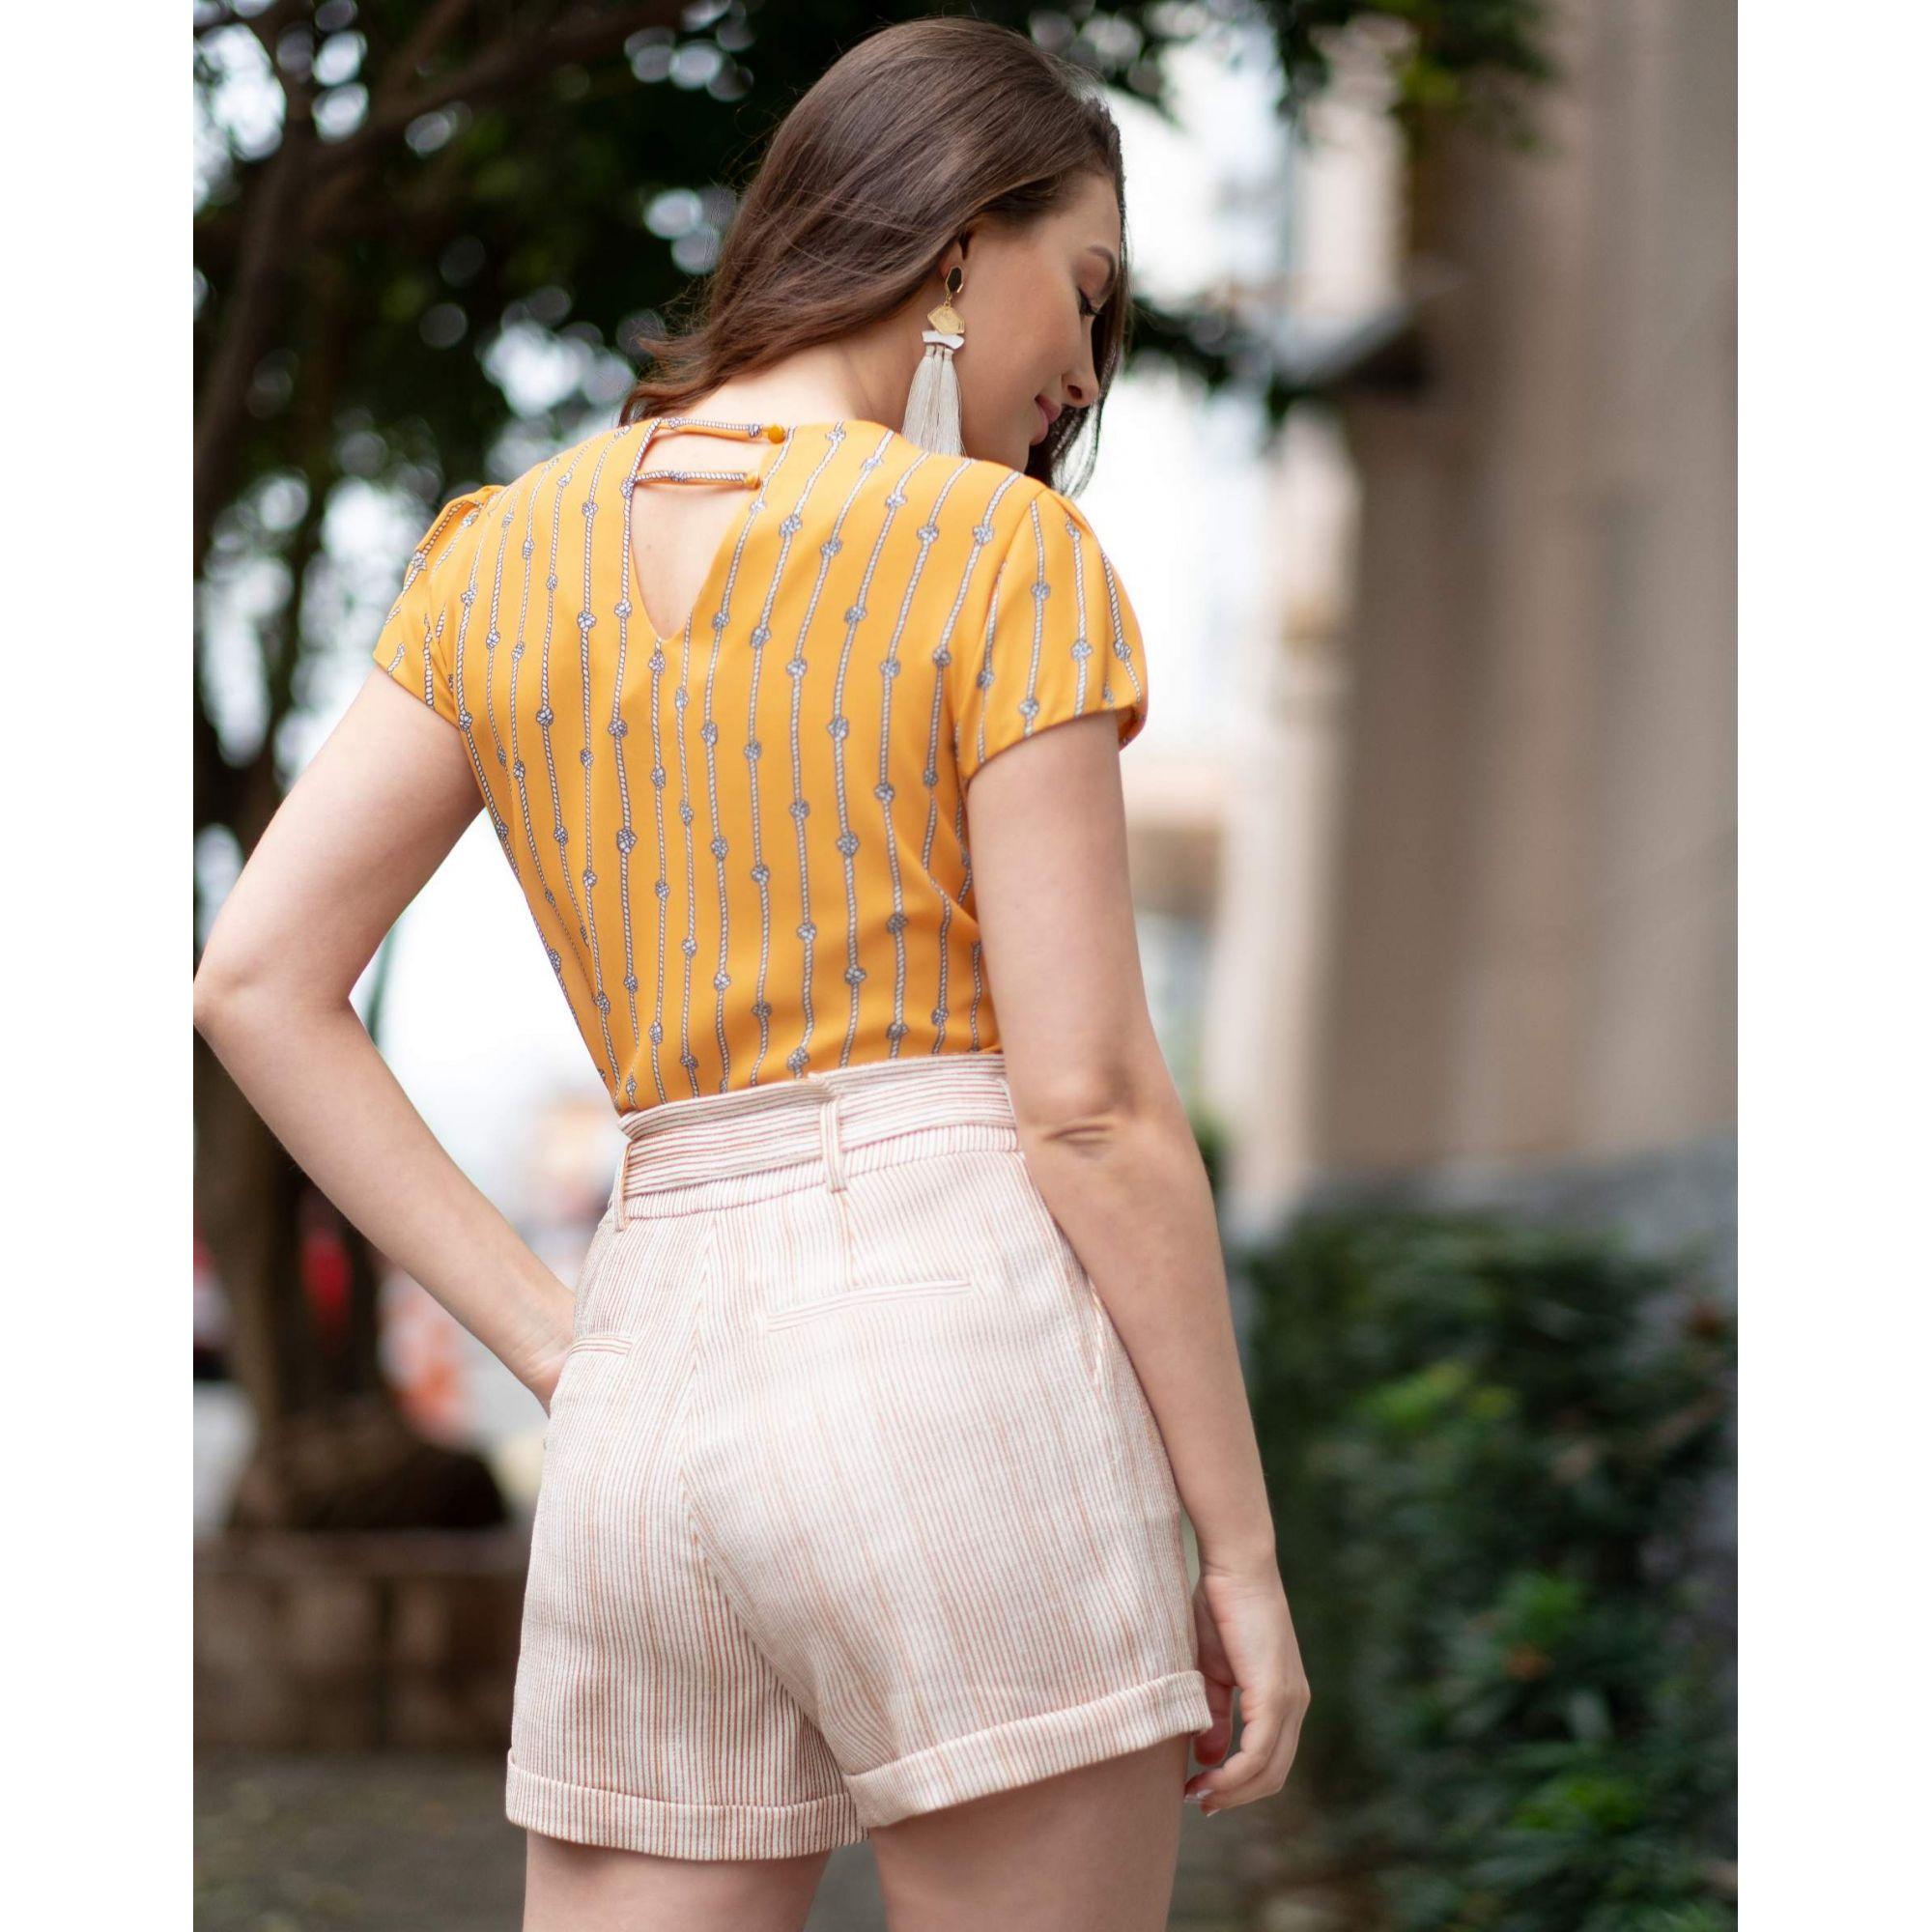 Blusa Manga Curta com Estampa Corda em Crepe Unique Chic